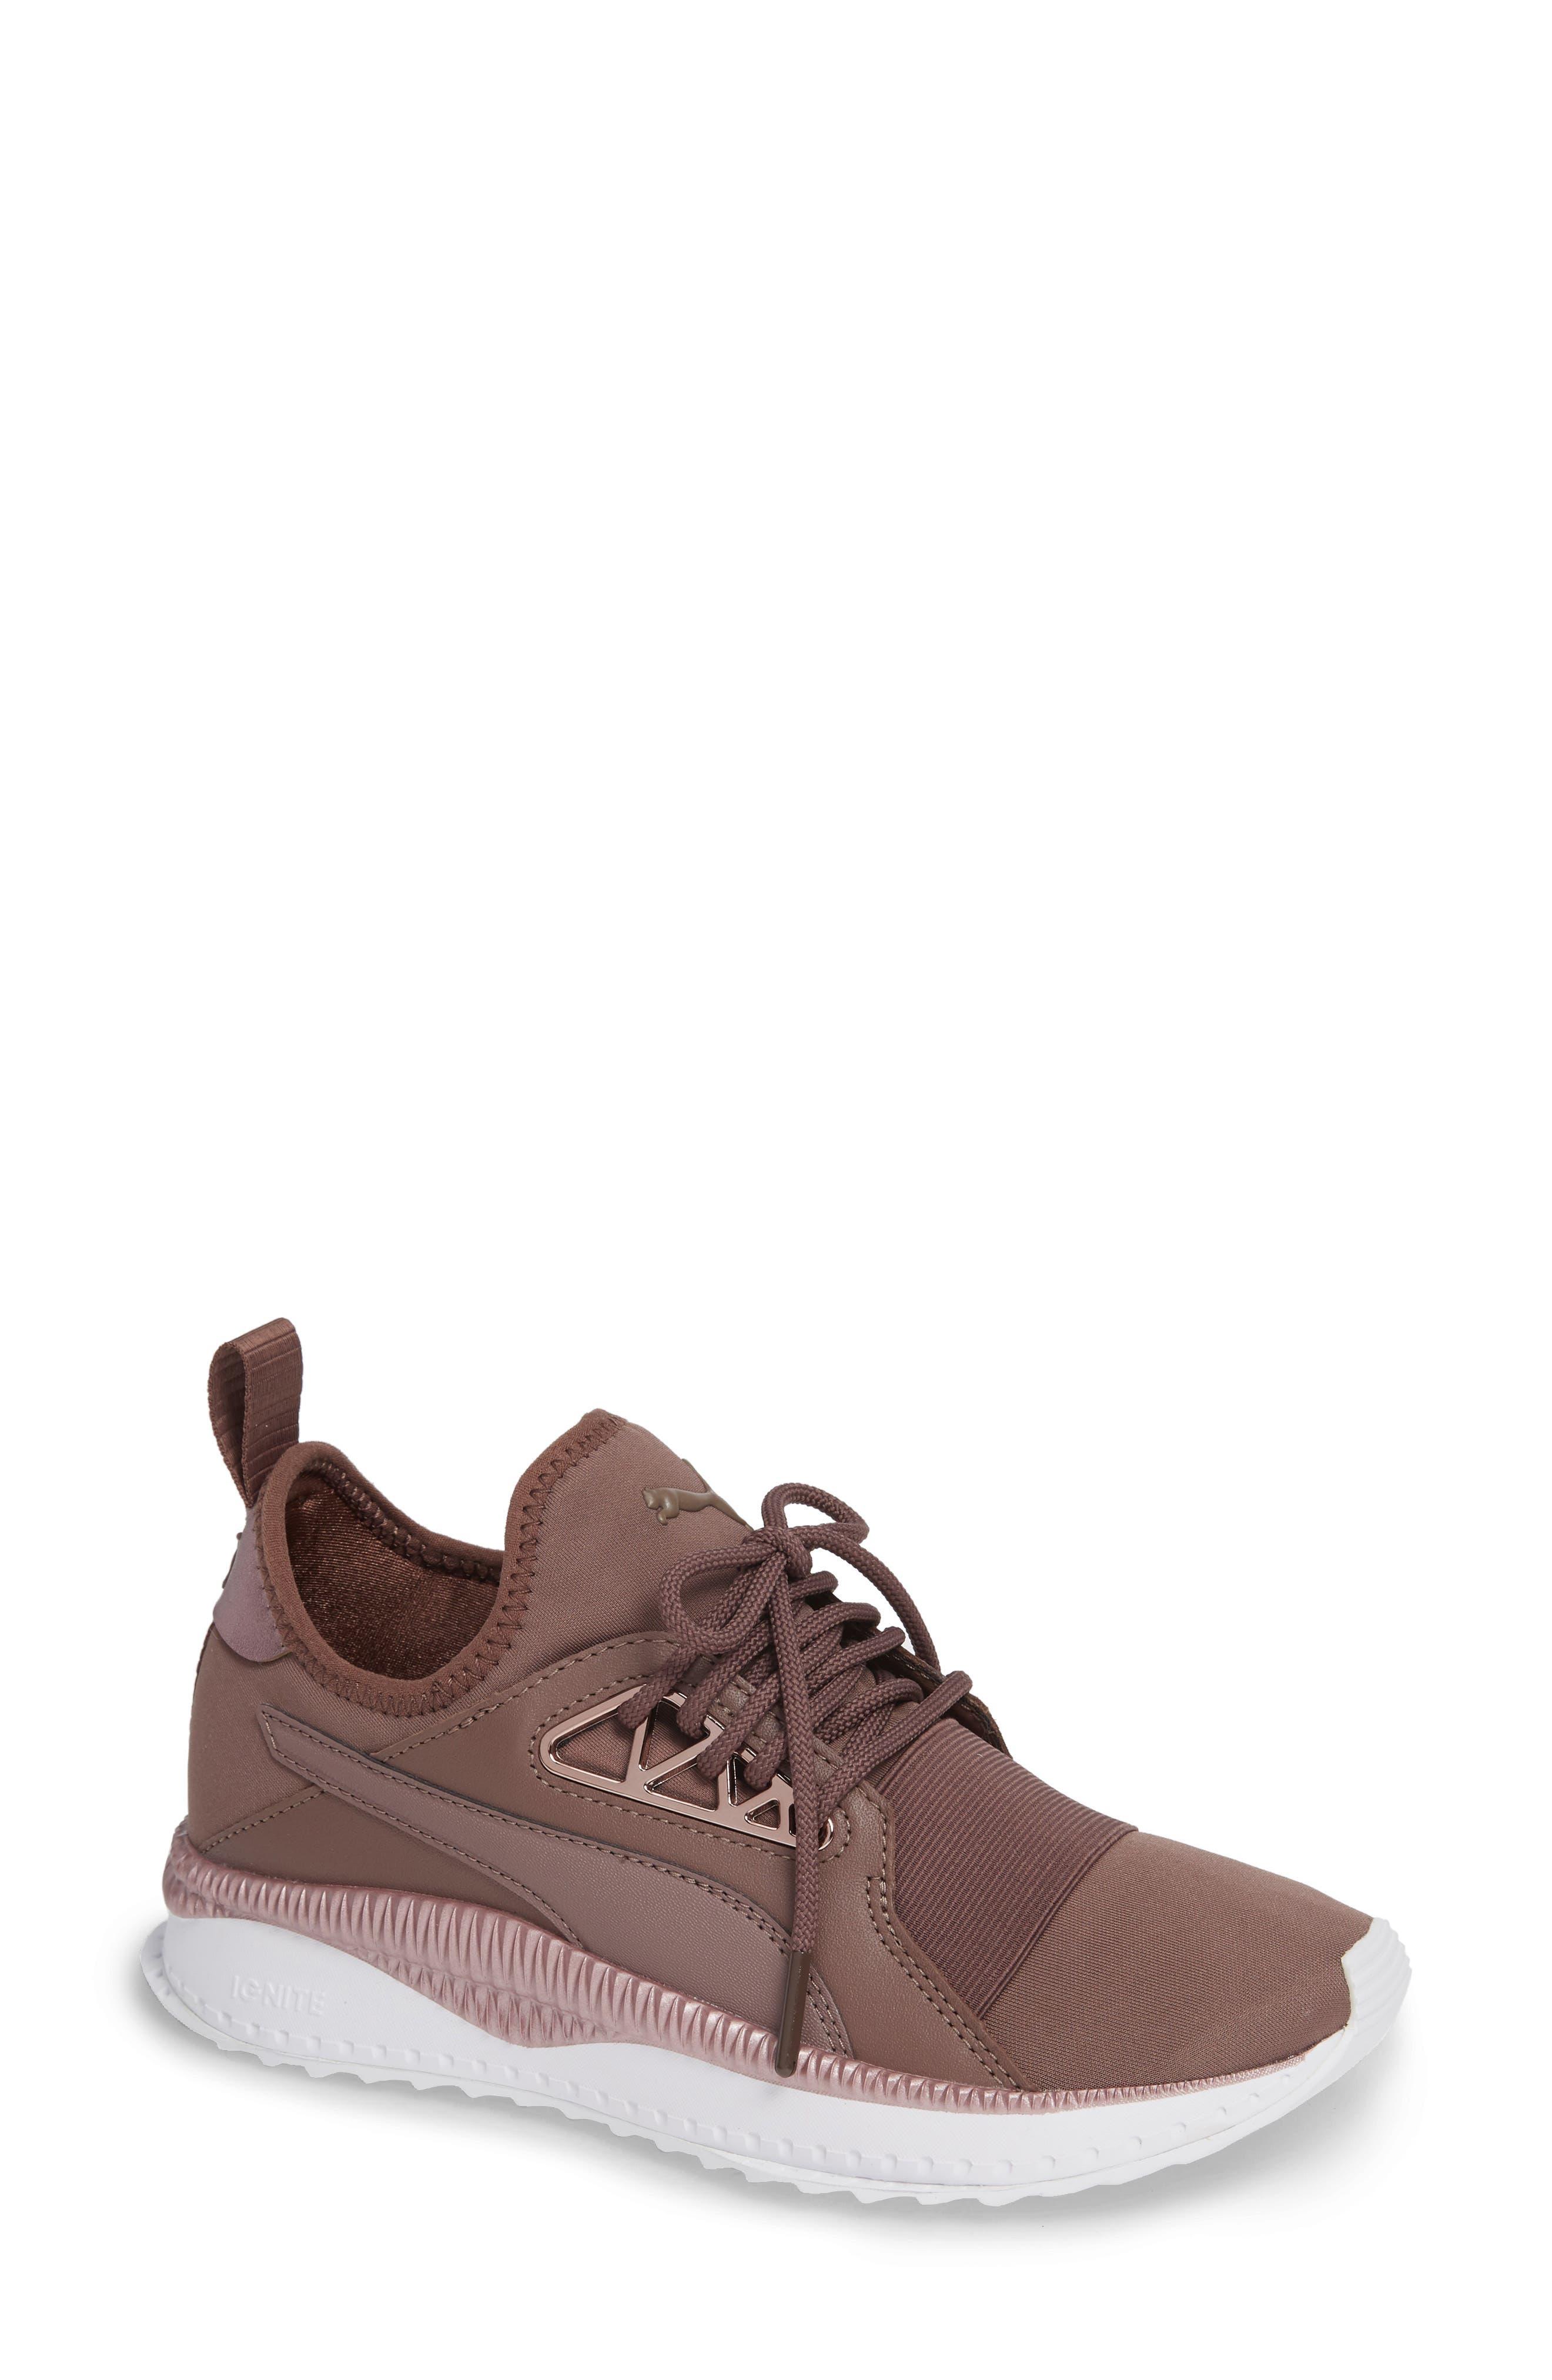 PUMA, TSUGI Apex Jewel Sneaker, Main thumbnail 1, color, PEPPERCORN/ PEPPERCORN